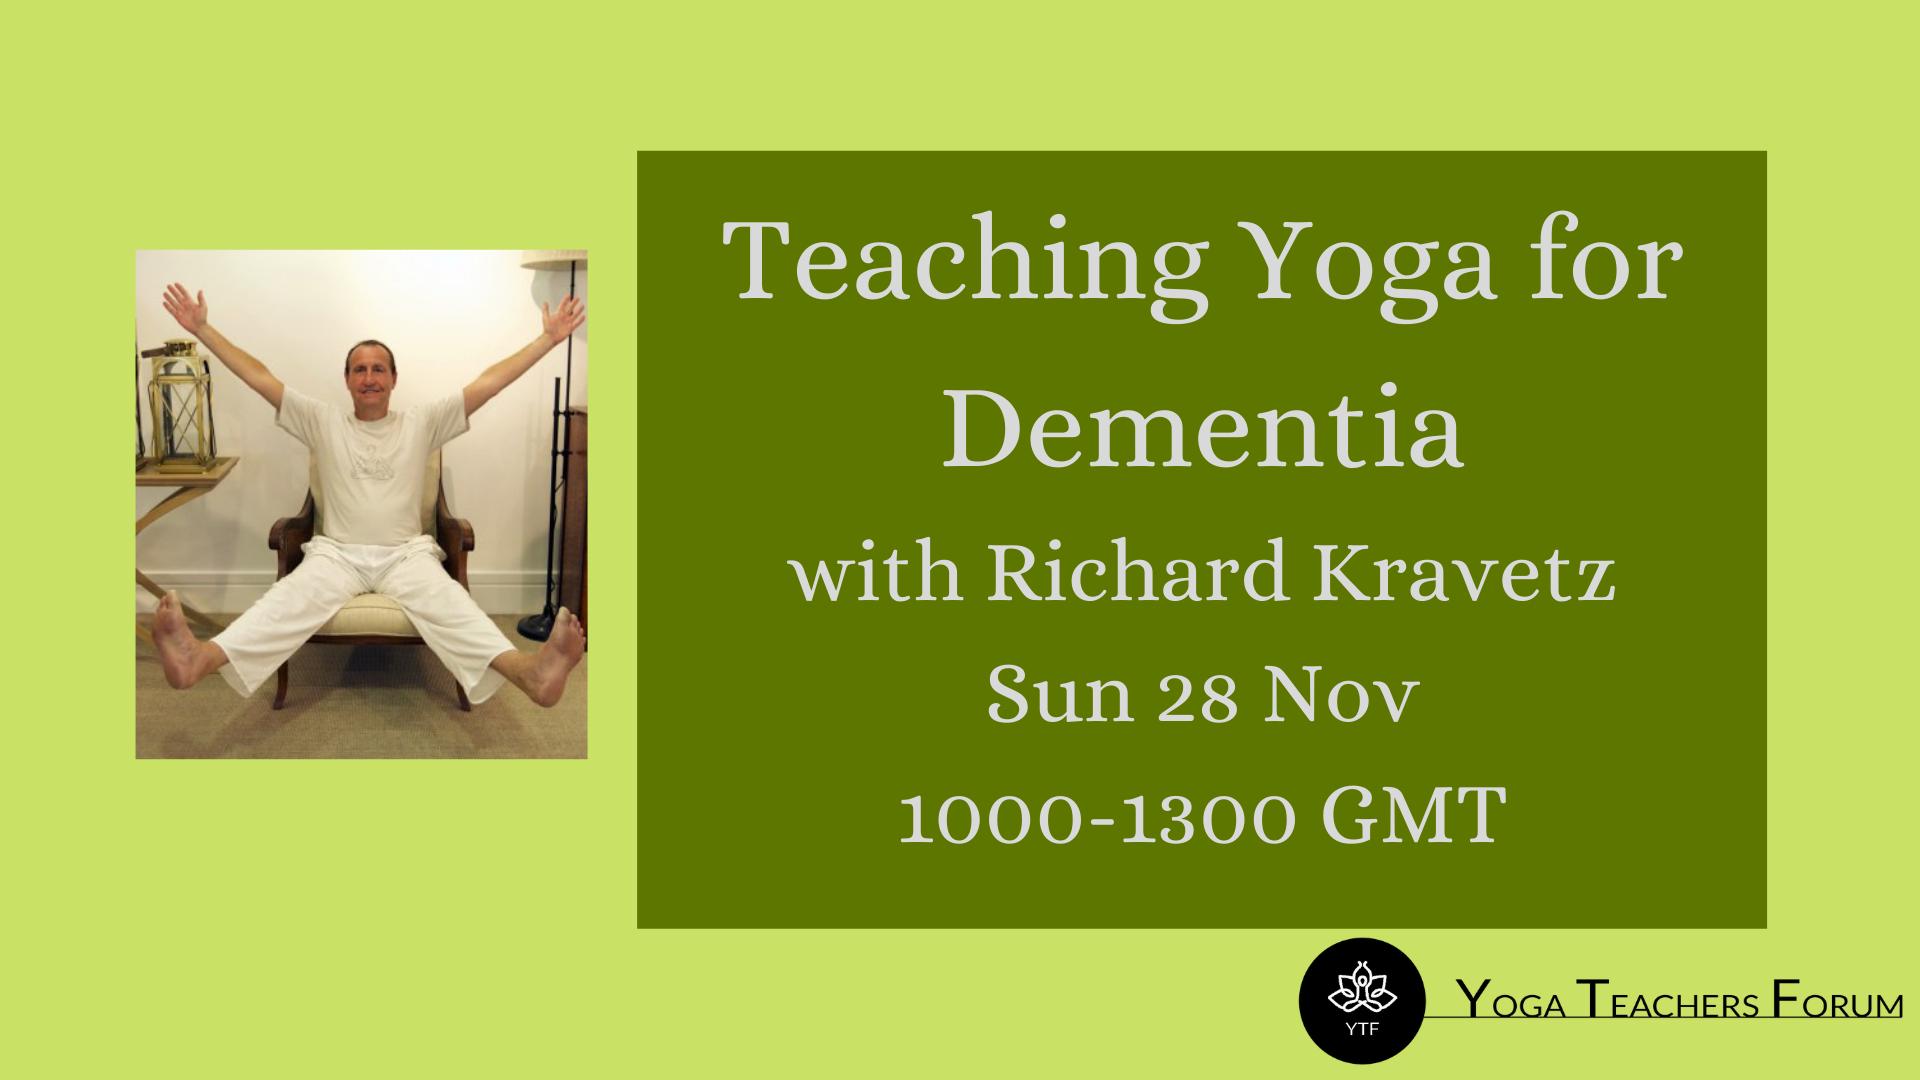 Teaching Yoga for Dementia with Richard Kravetz Sun 28 Nov 1000-1300 GMT